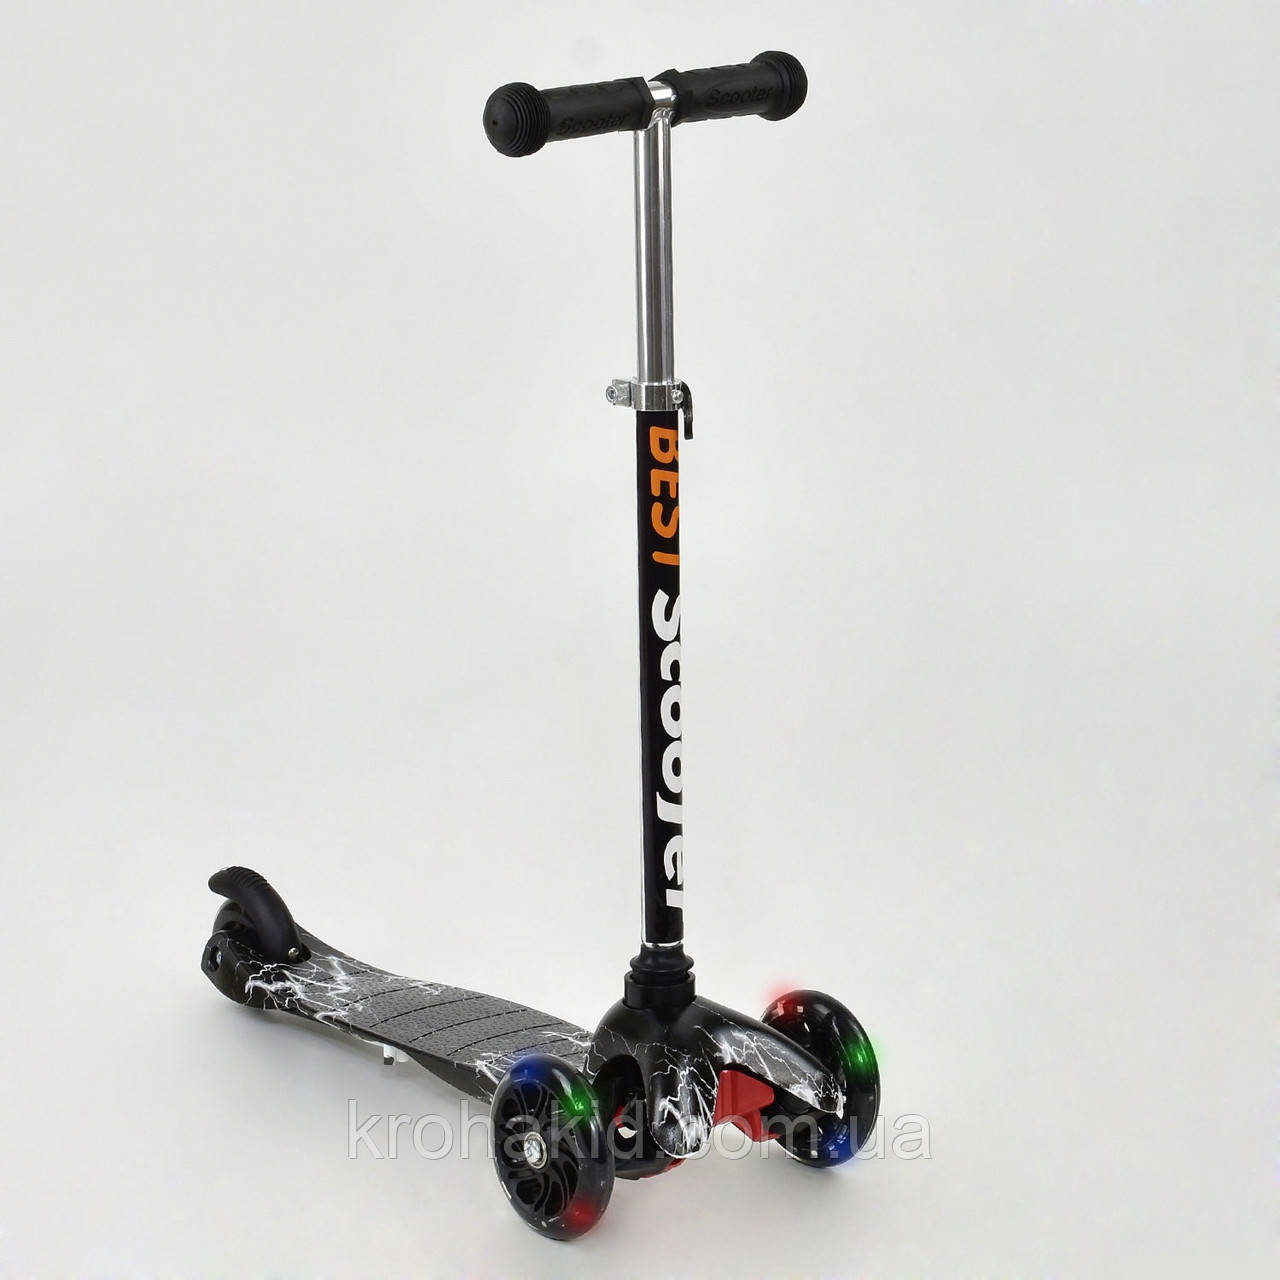 Самокат Best Scooter  1287  Mini  Графический рисунок (черно-белый)